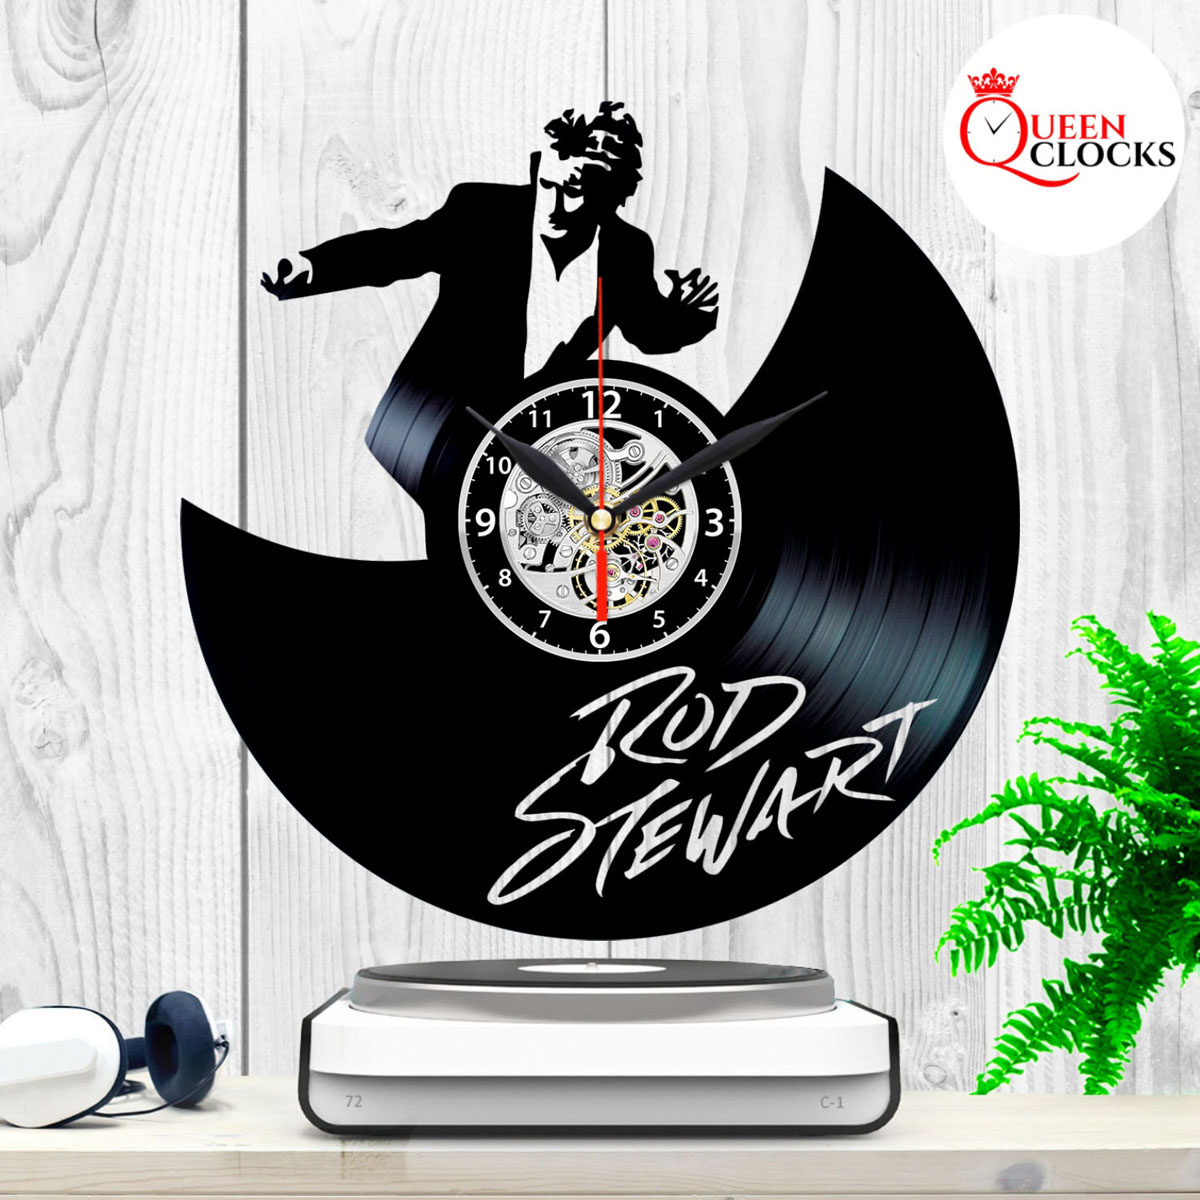 Rod Stewart Vinyl Record Wall Clock Collection Autograph